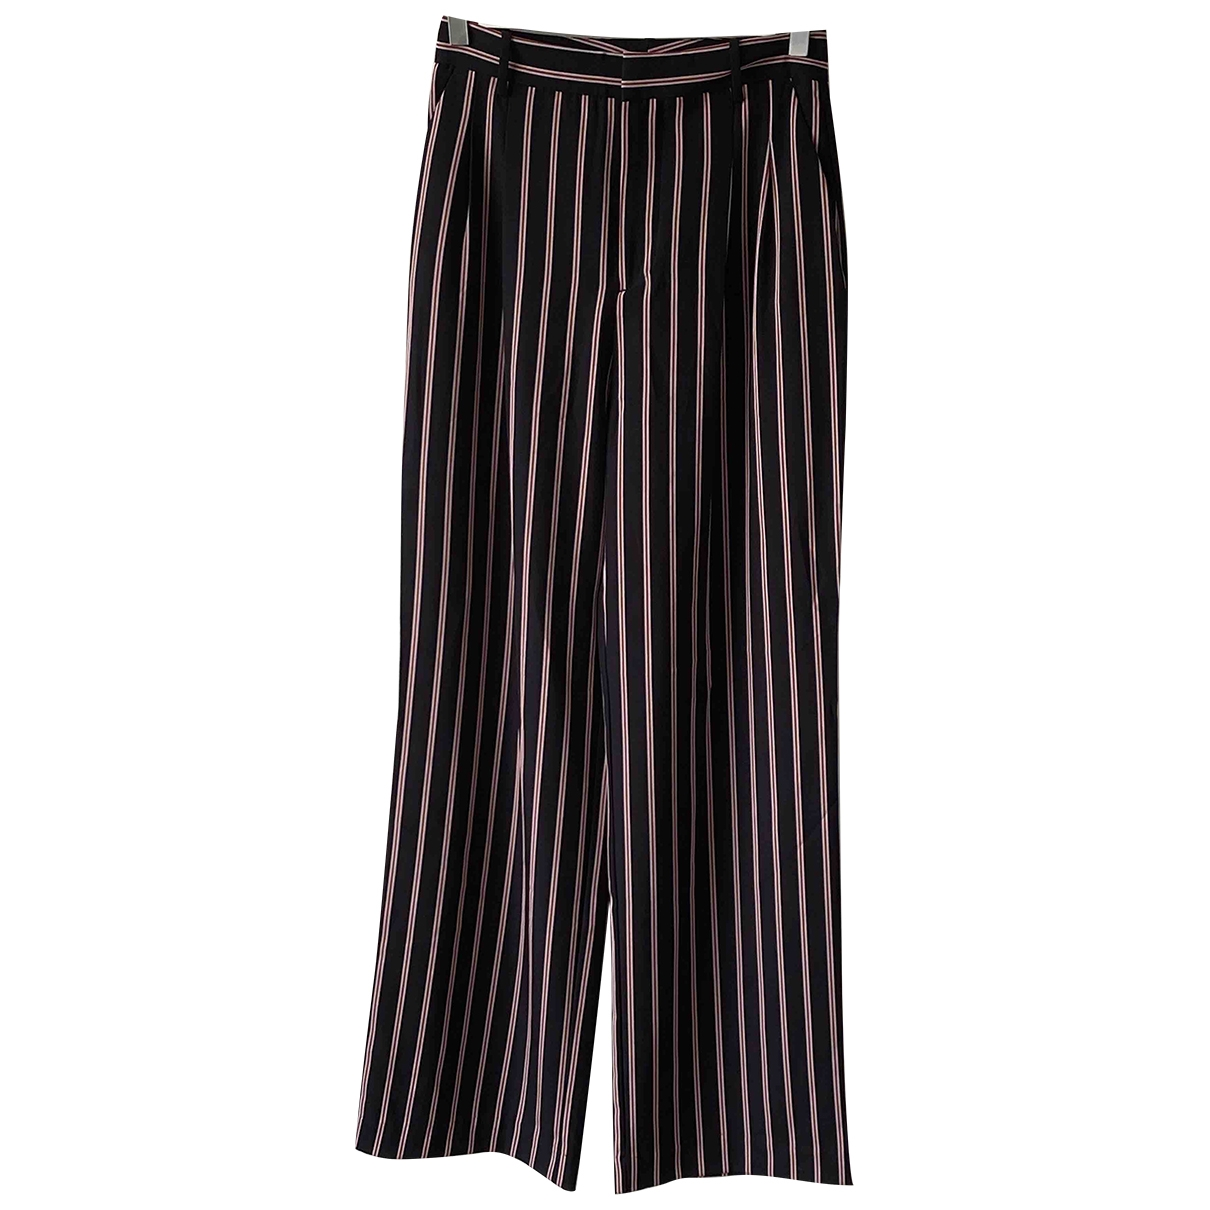 Zara \N Navy Trousers for Women S International